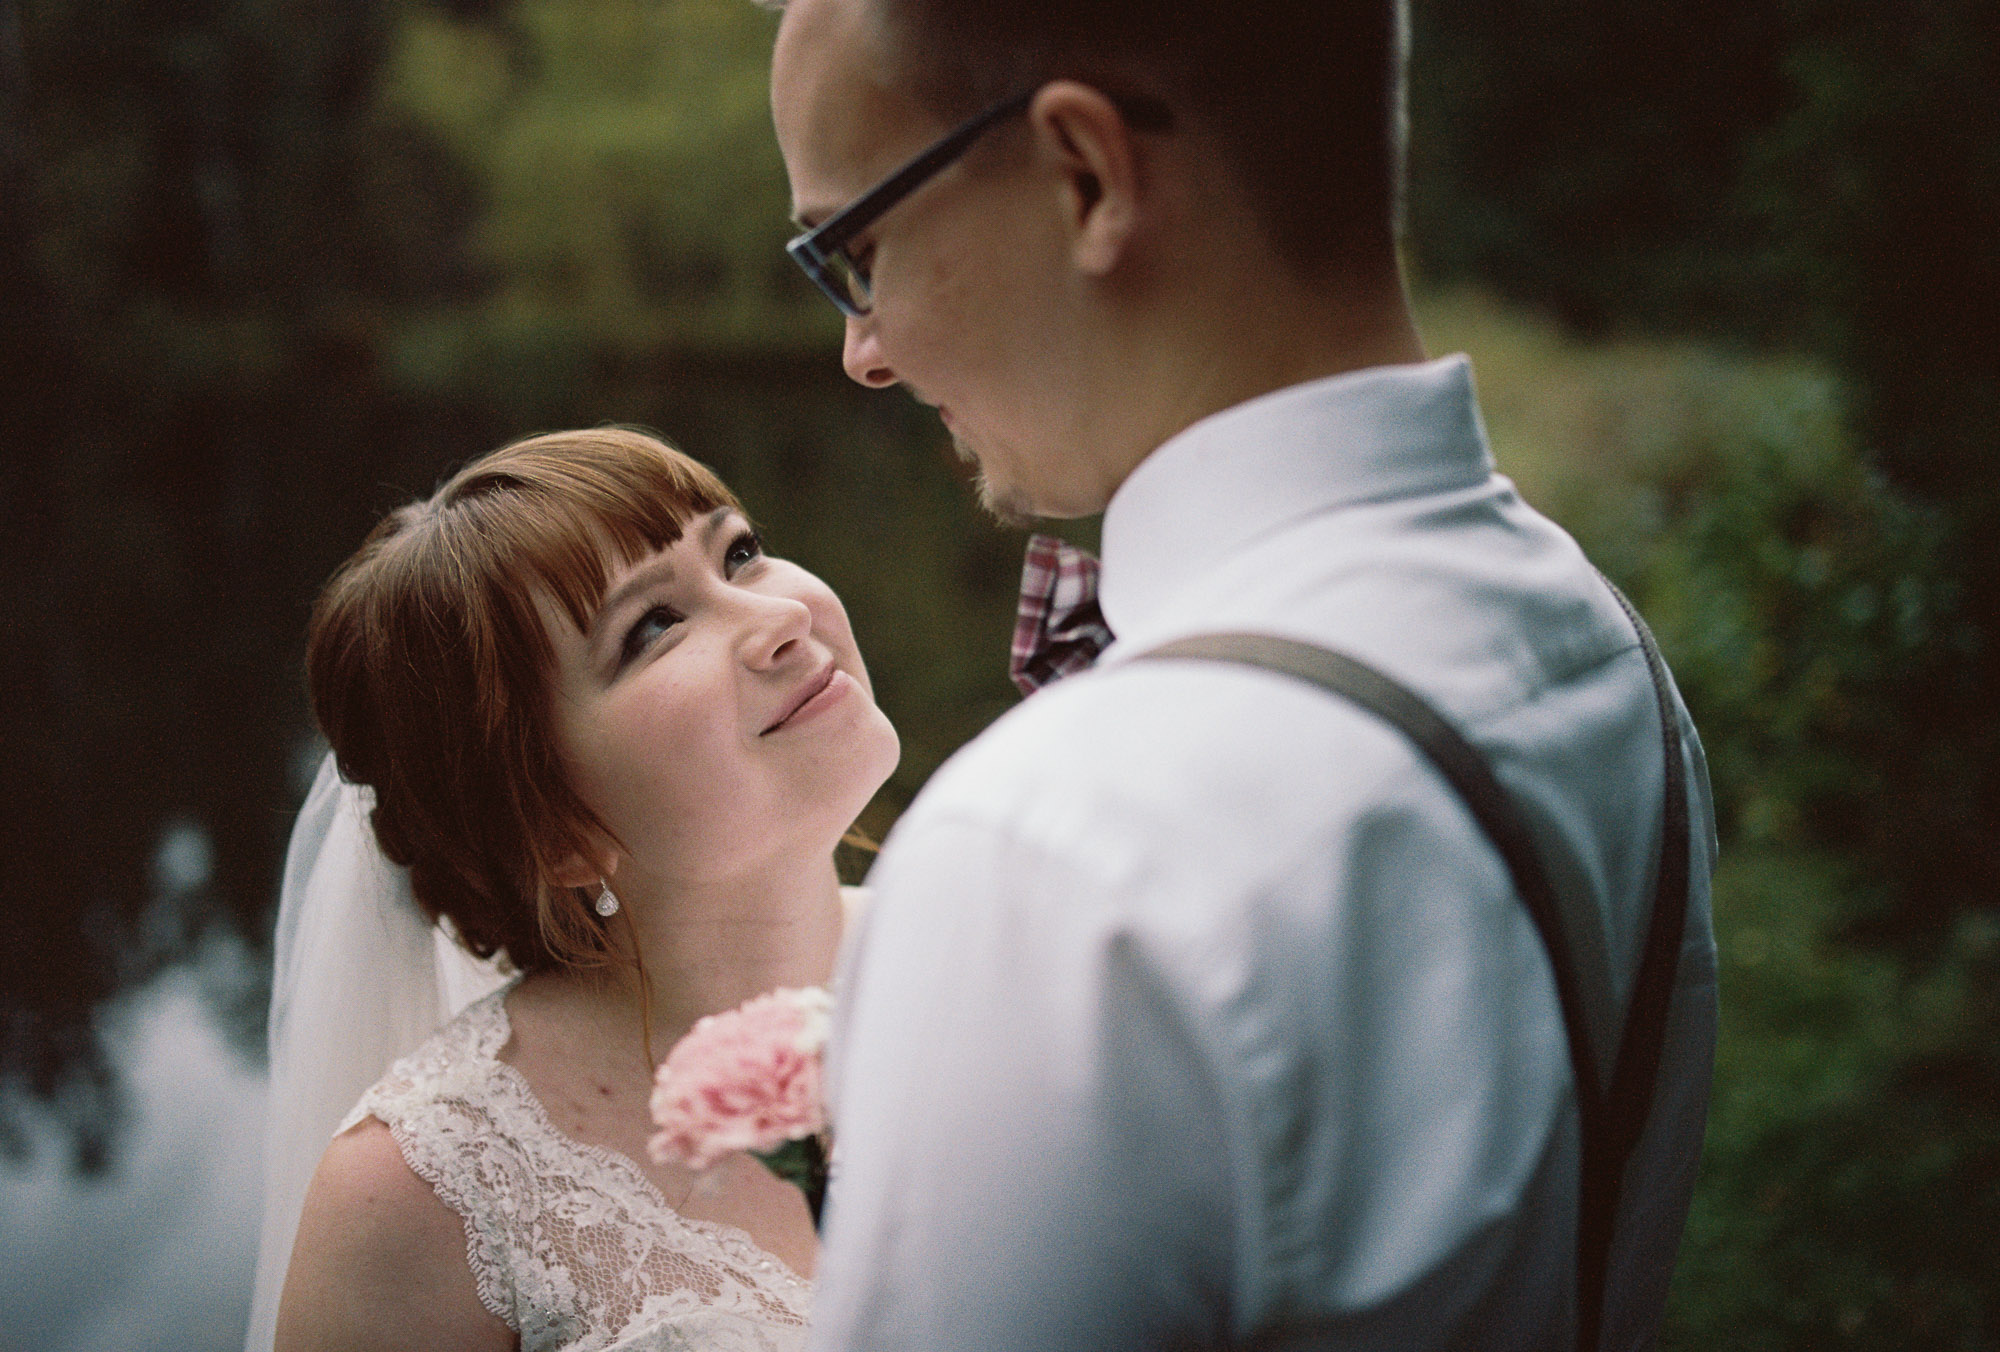 jere-satamo-analog-film-wedding-photographer-finland-104.jpg